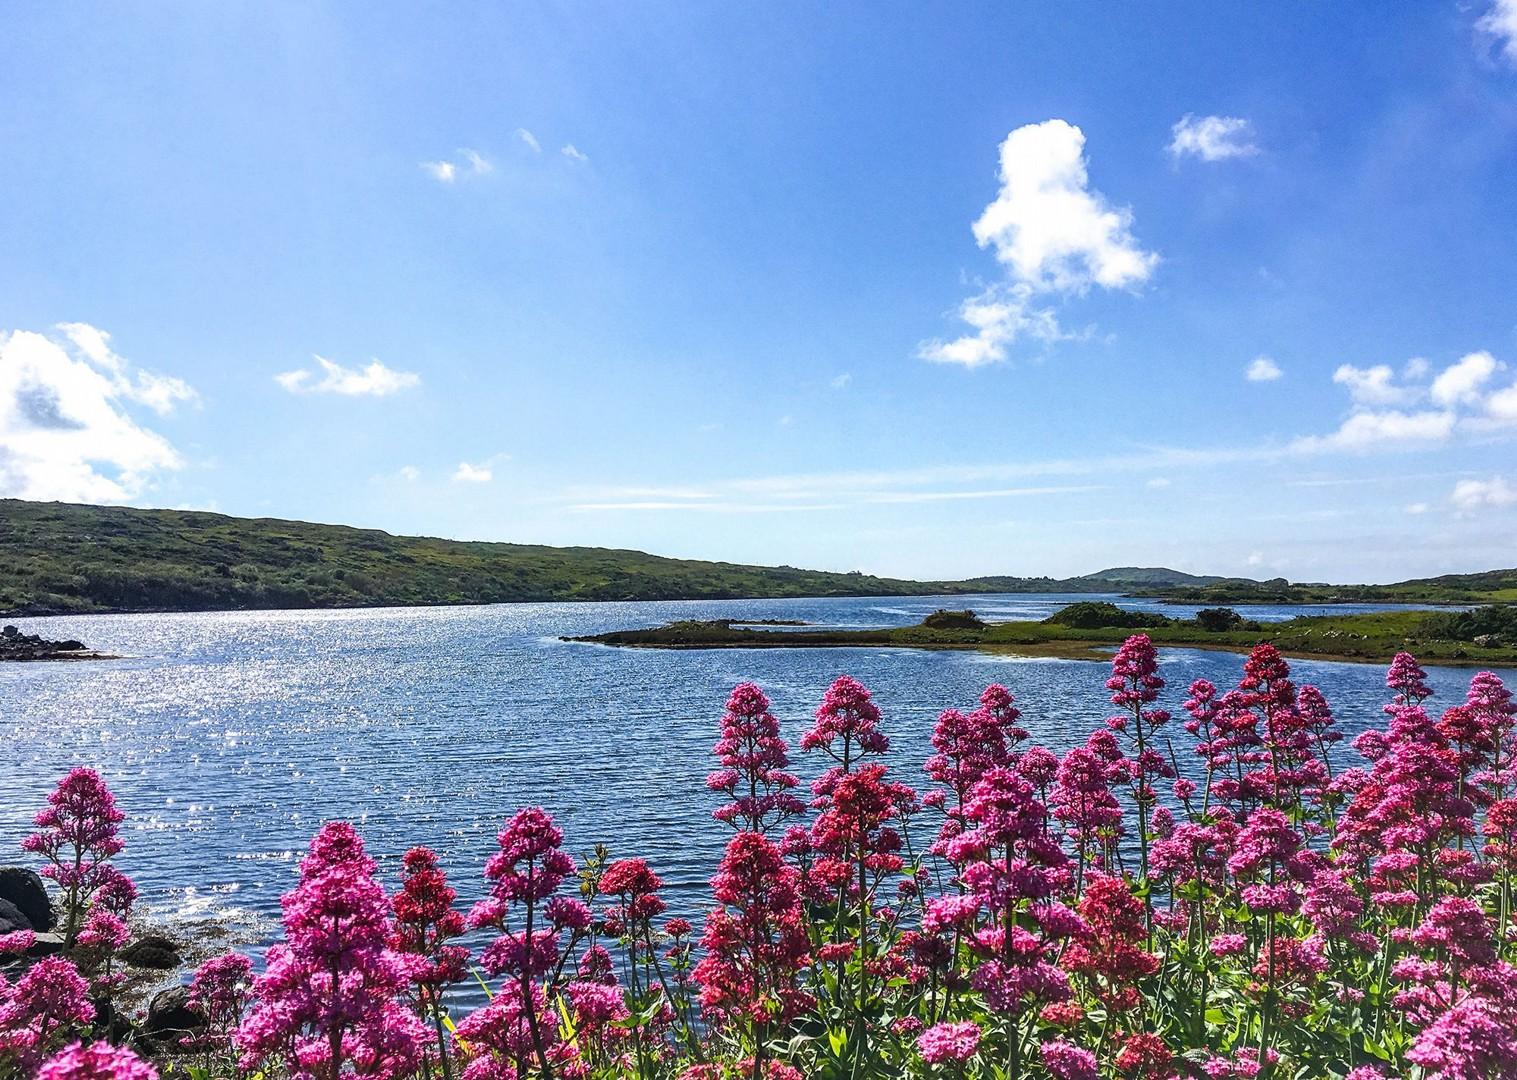 ireland-connemara-and-aran-isles-leisure-cycling-holiday-trip-self-guided.jpg - NEW! Ireland - Connemara and the Aran Isles - Leisure Cycling